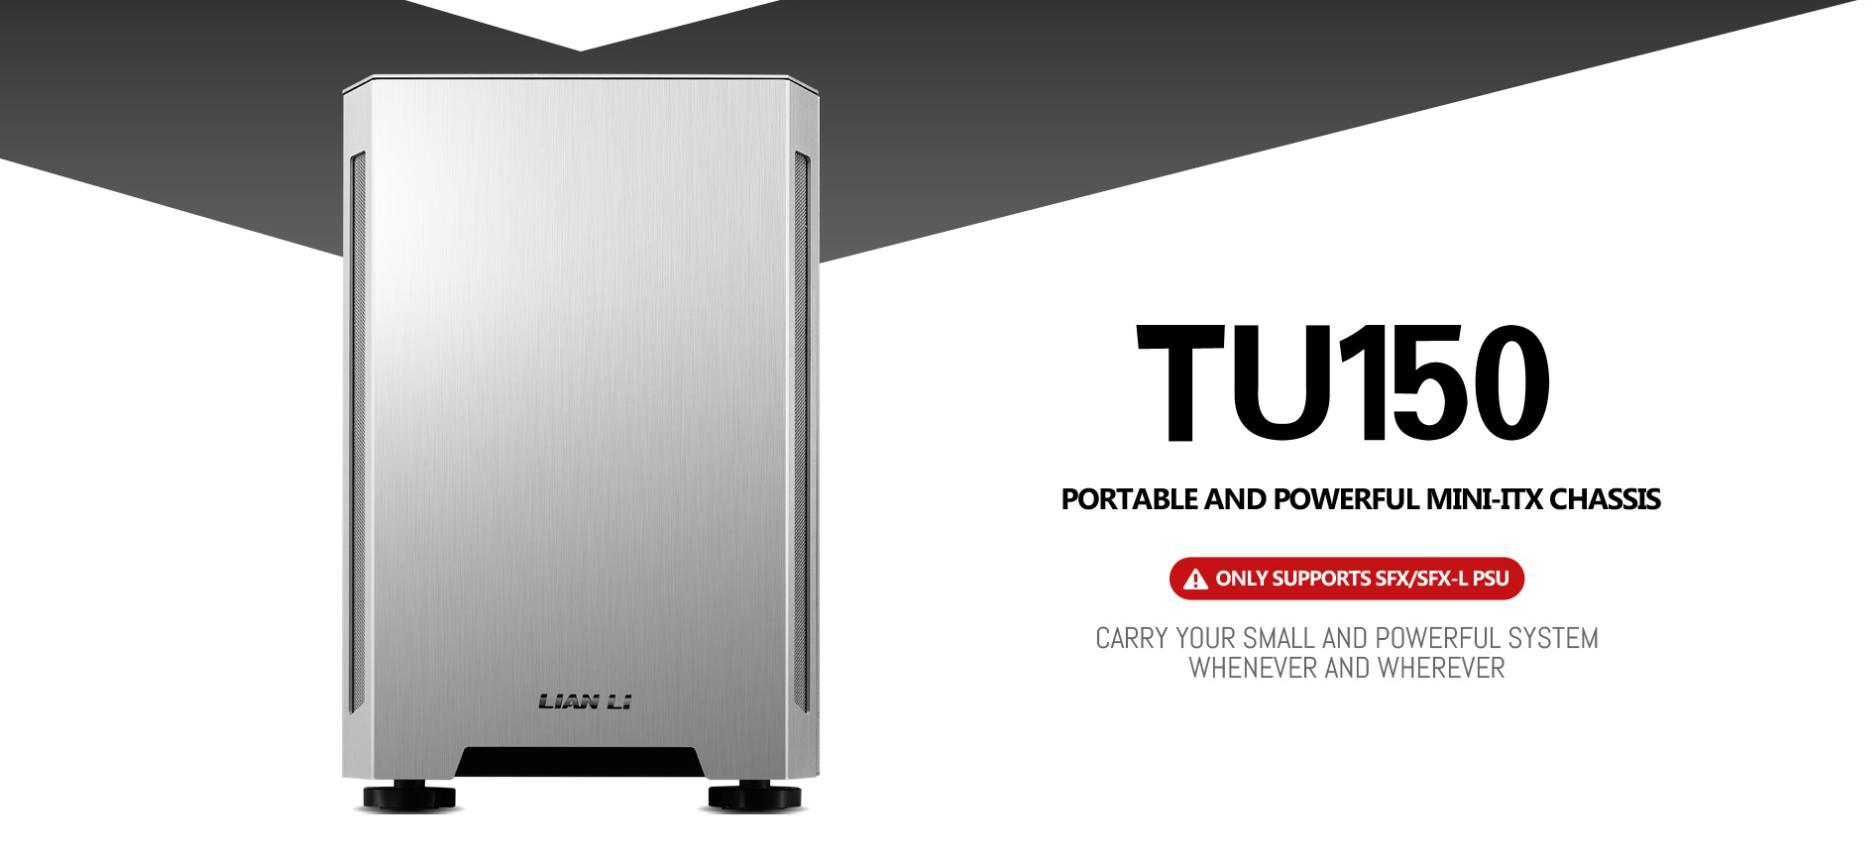 Case Lianli TU150 ((Mini Tower/Màu Bạc) giới thiệu